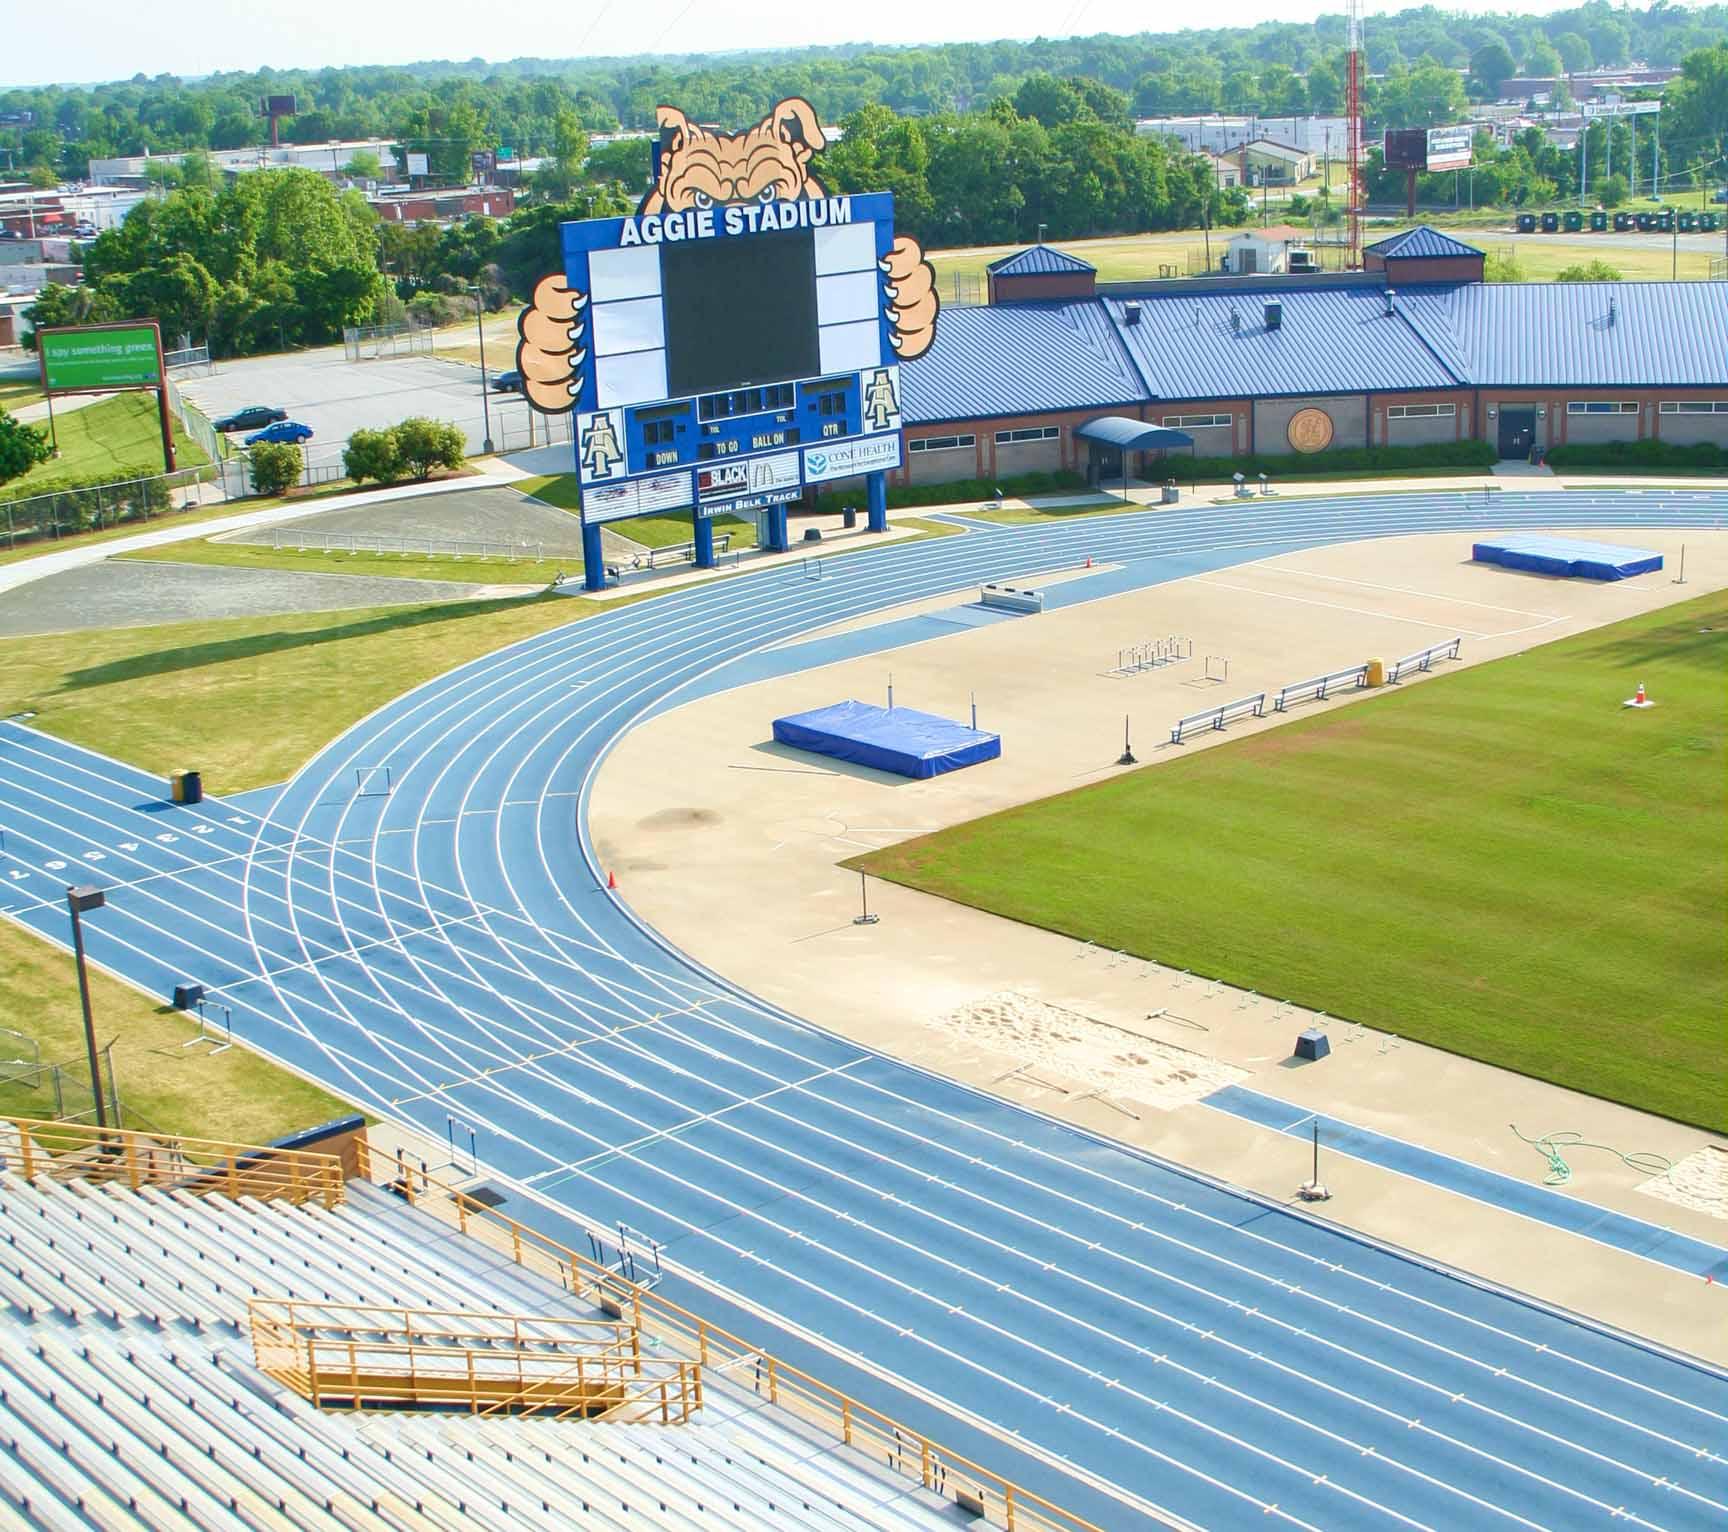 Greensboro: North Carolina's Finest - Sports Planning Guide